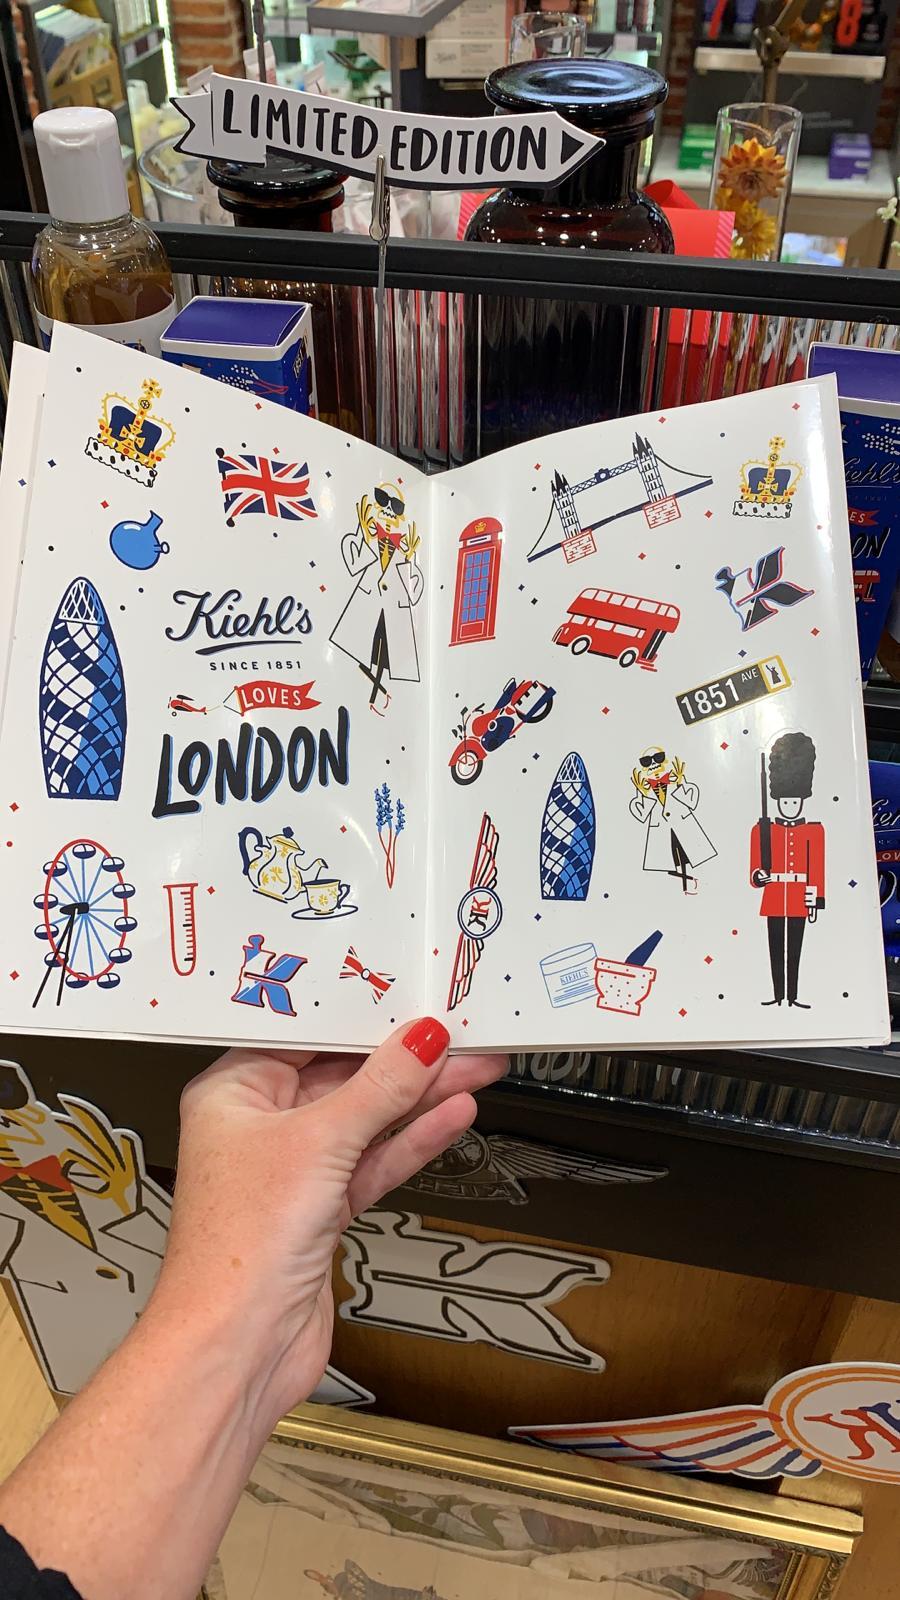 KIEHLS LOVES LONDON - Sticker Book